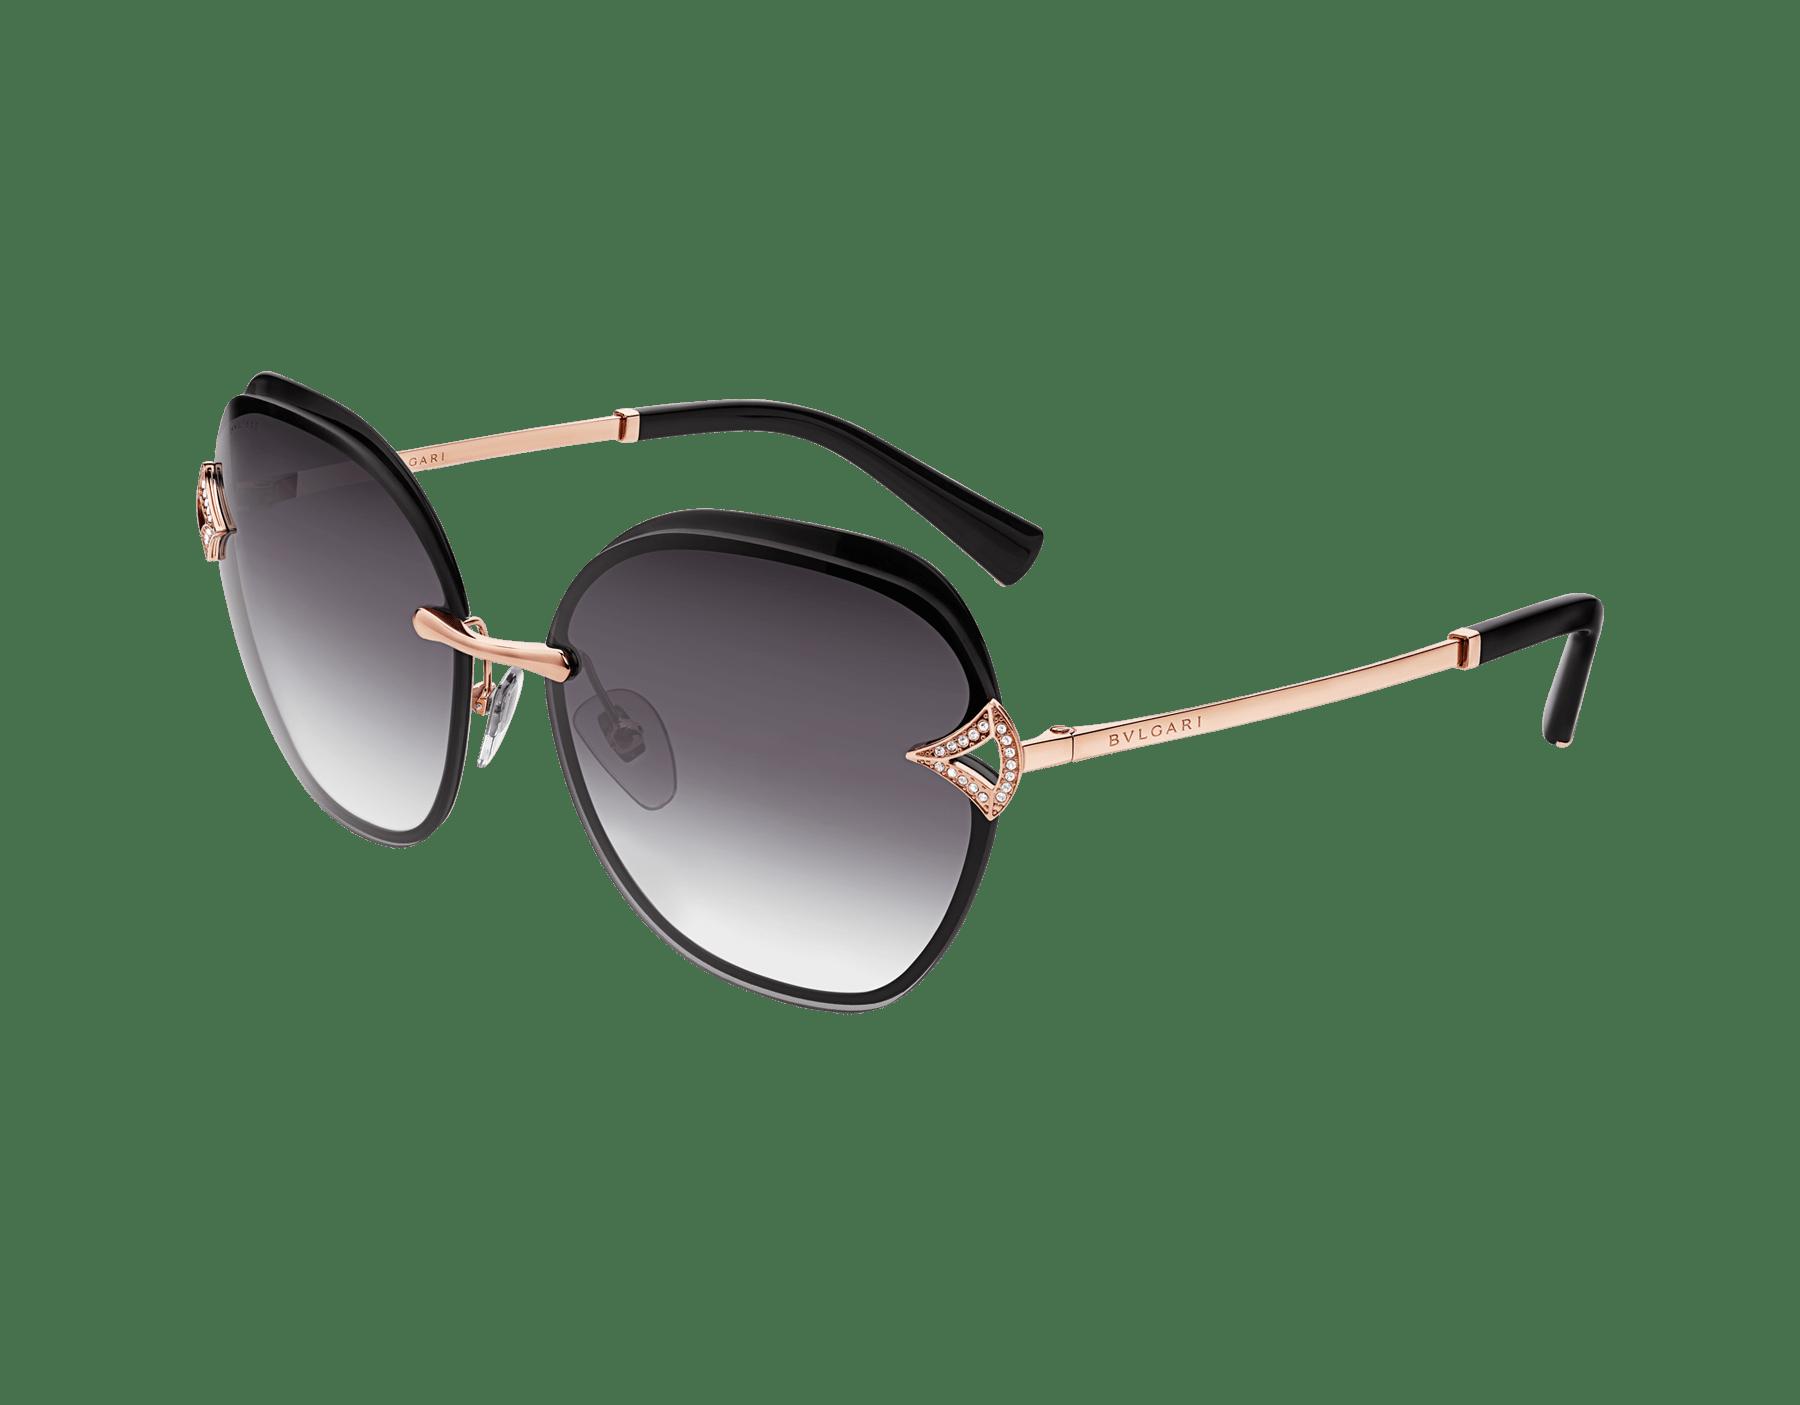 Bvlgari DIVAS' DREAM angular squared metal sunglasses 903667 image 1